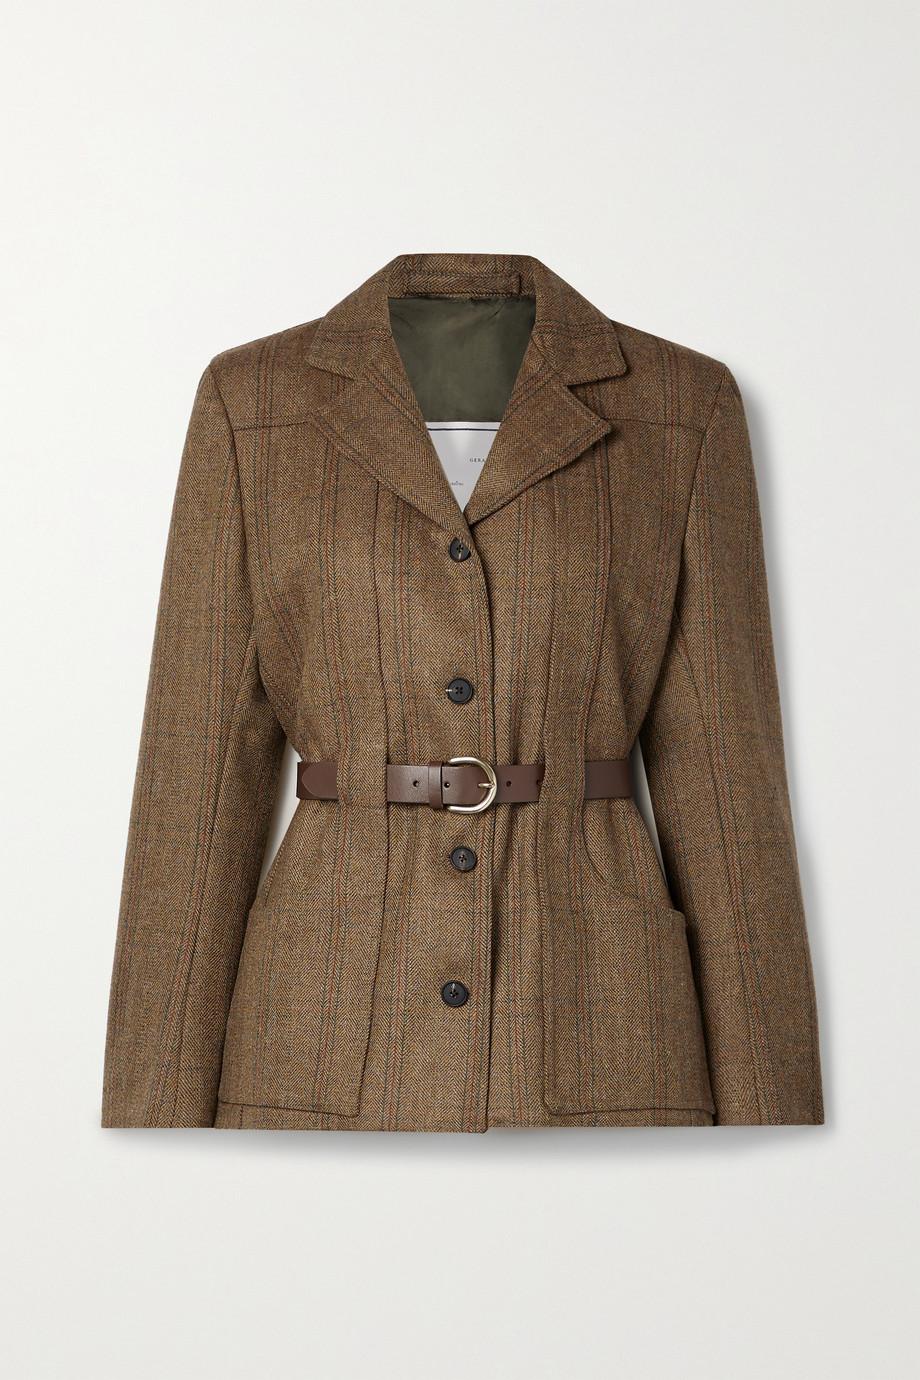 Giuliva Heritage + NET SUSTAIN The Nora belted checked herringbone wool jacket